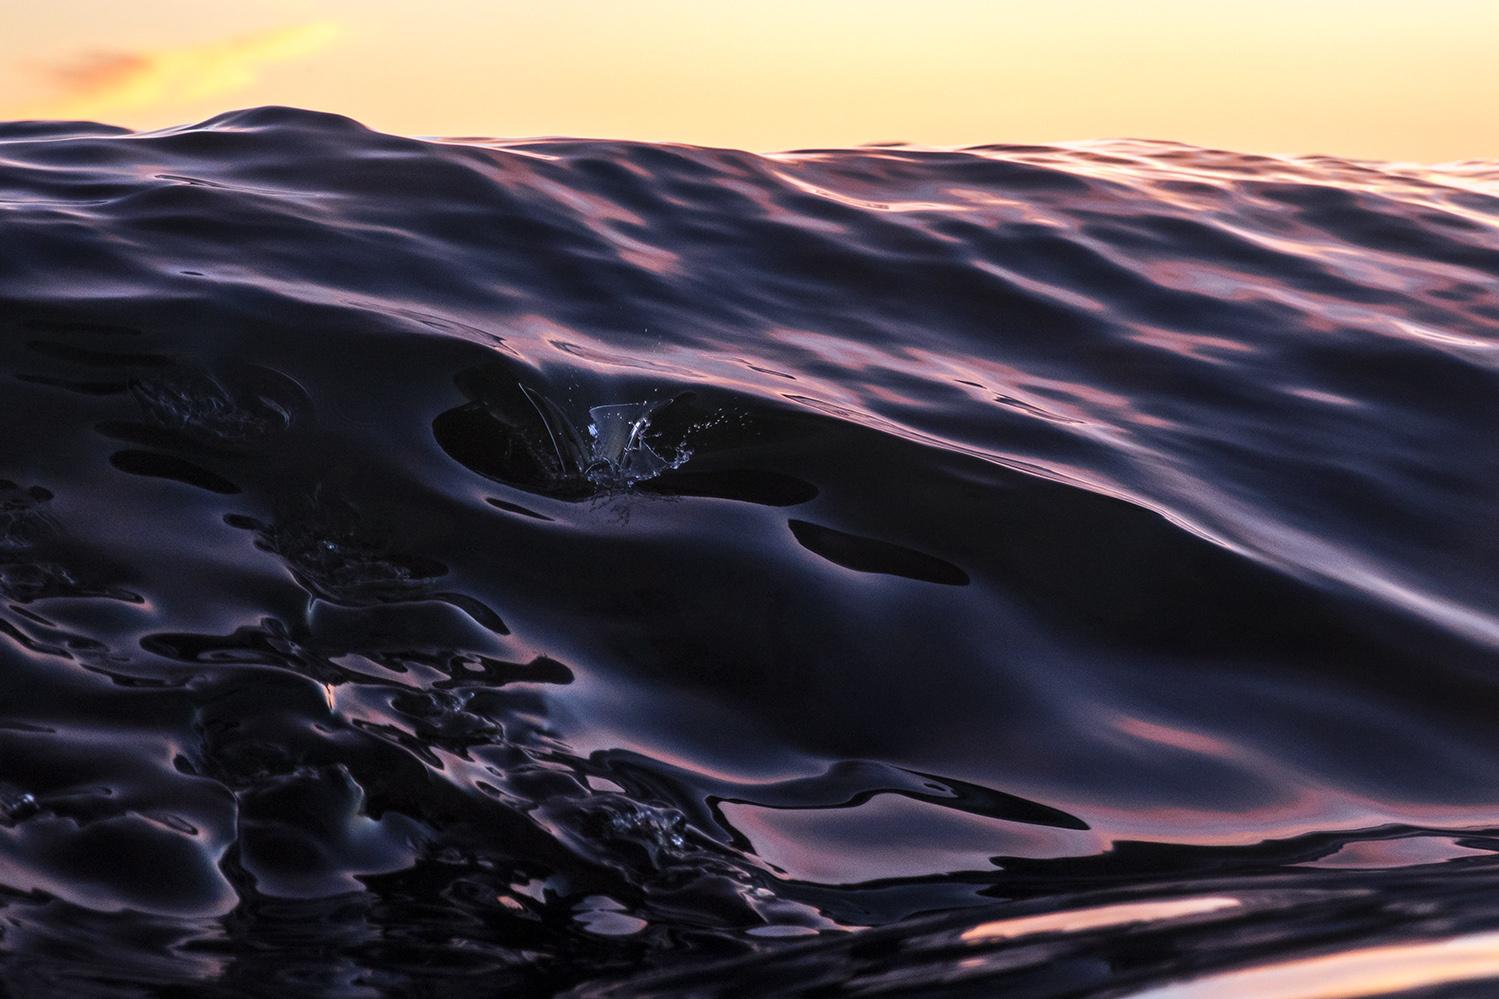 The Blob by Marcus Paladino